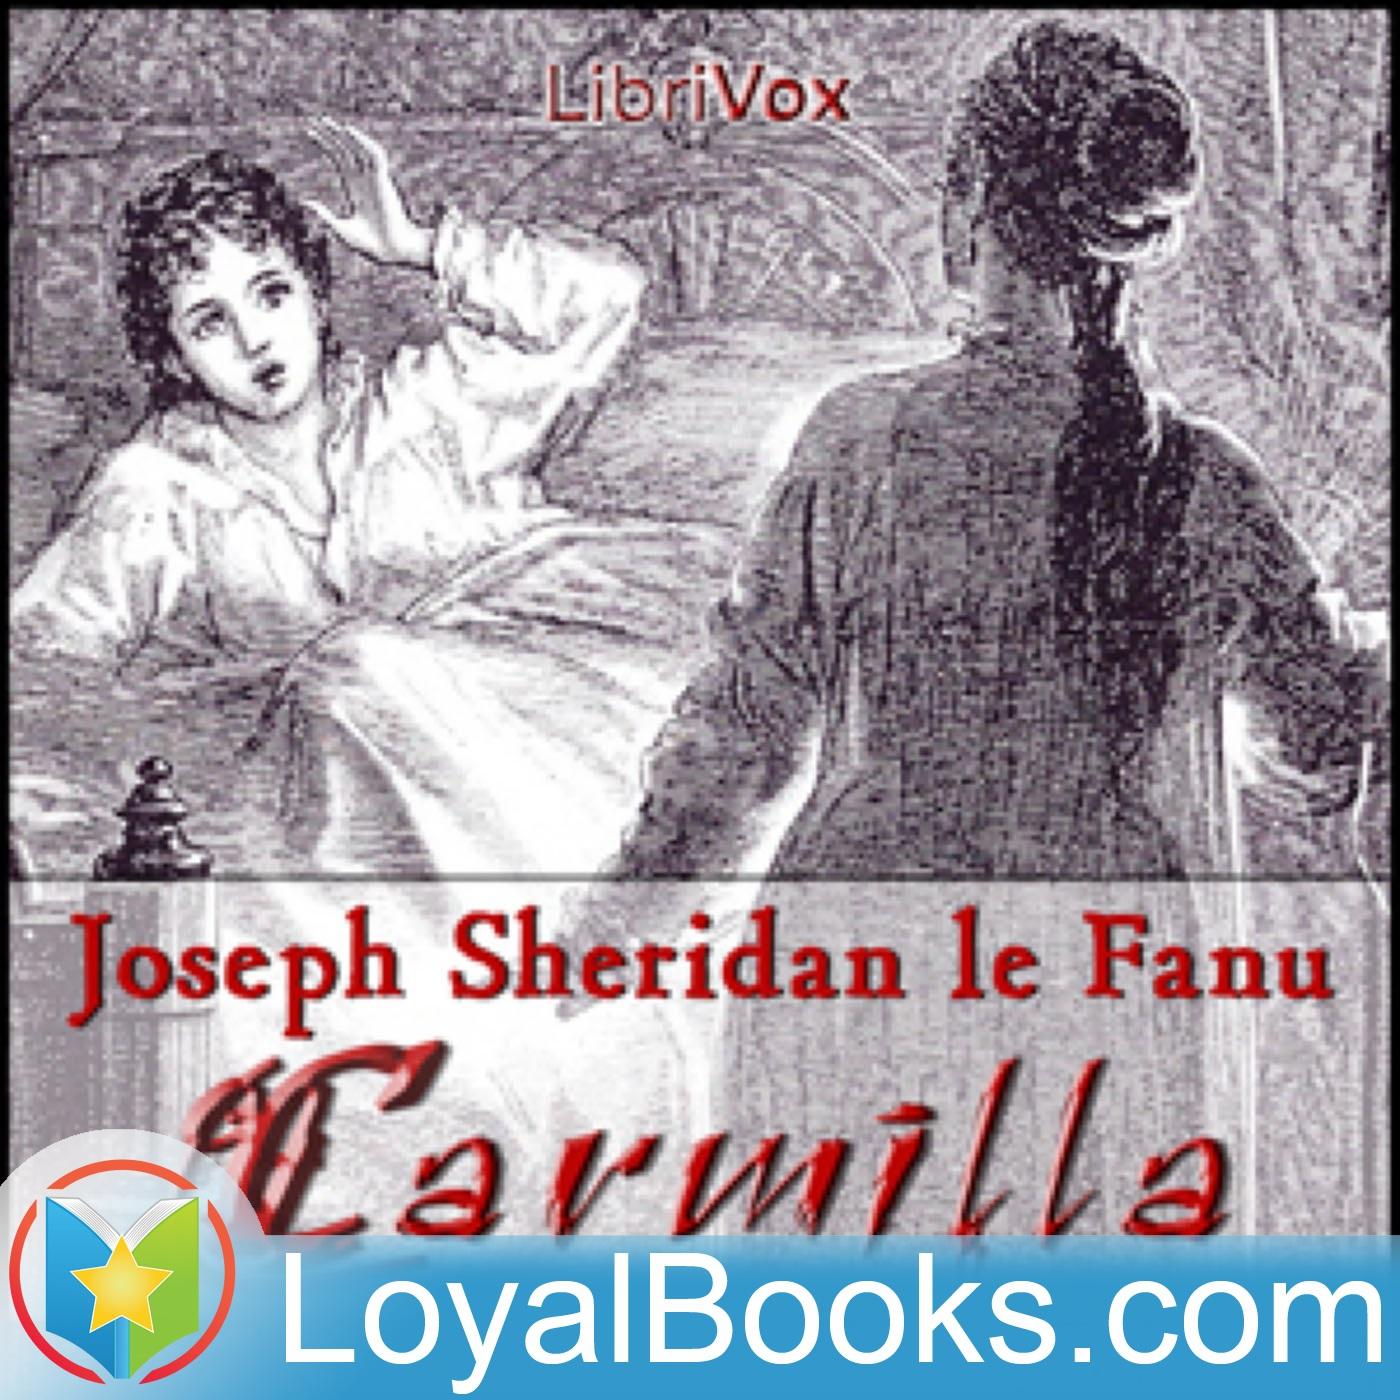 <![CDATA[Carmilla by Joseph Sheridan LeFanu]]>